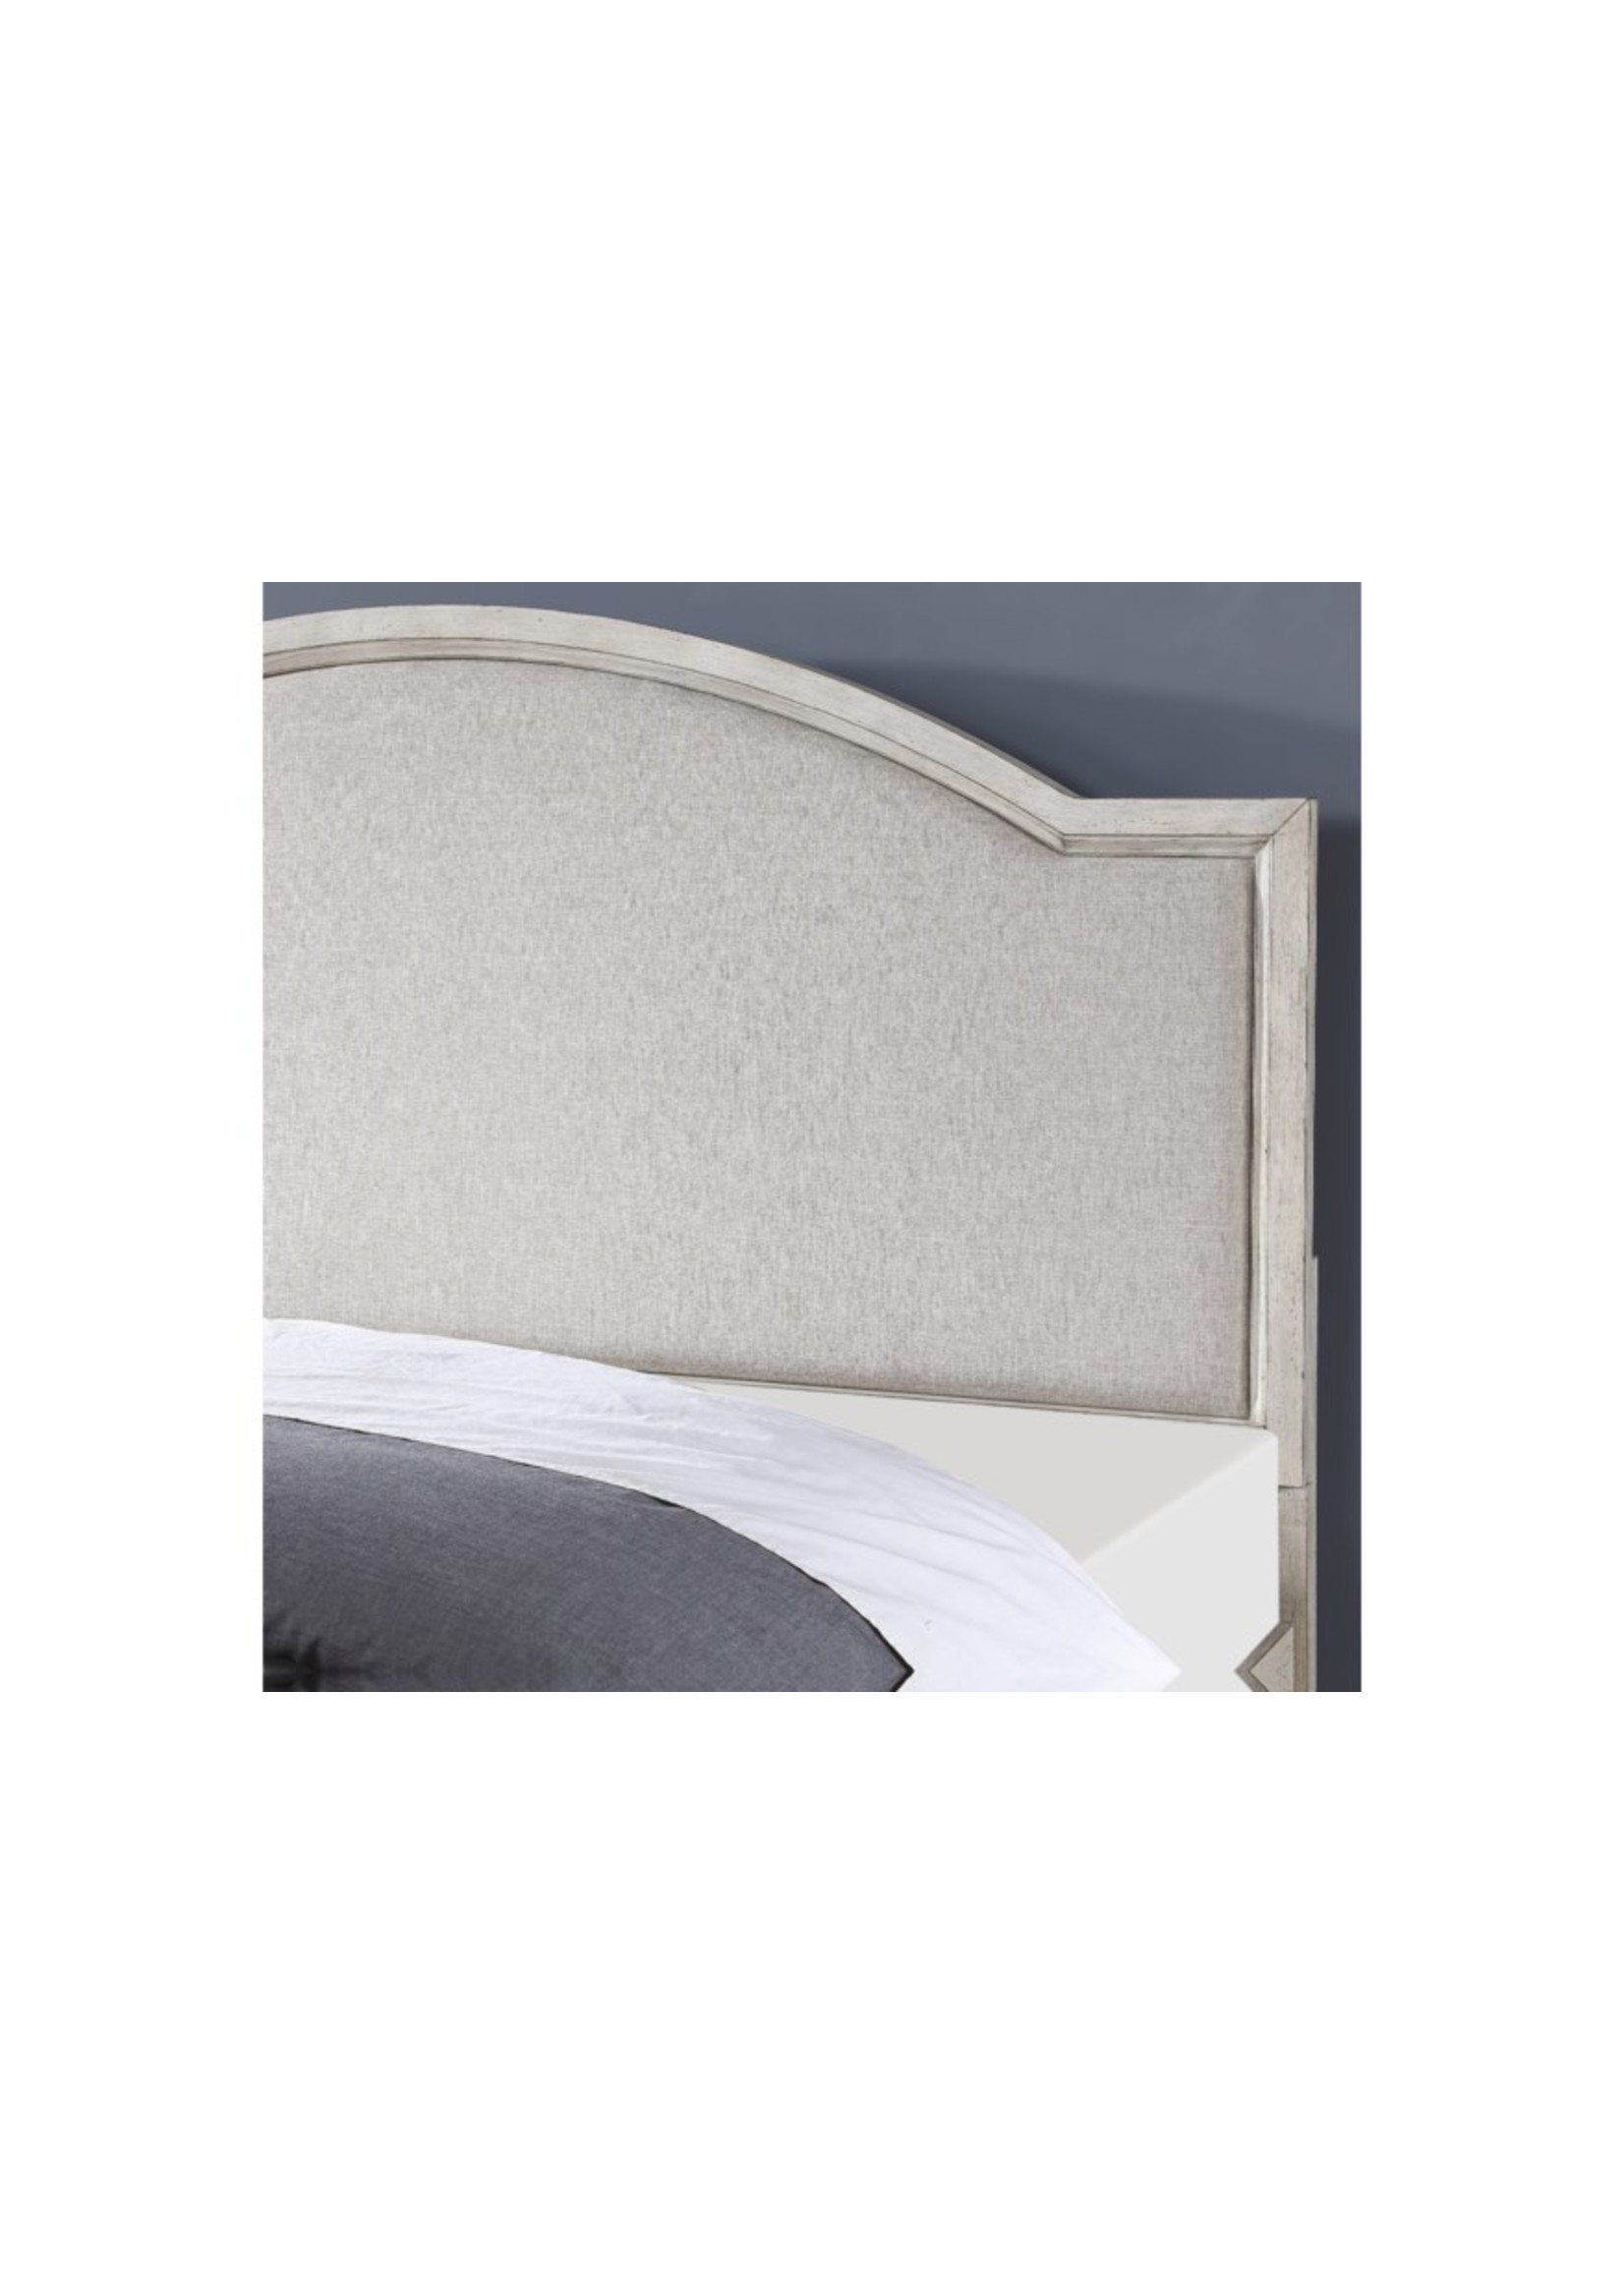 FLEXSTEEL NEWPORT KING BED IN OFF WHITE